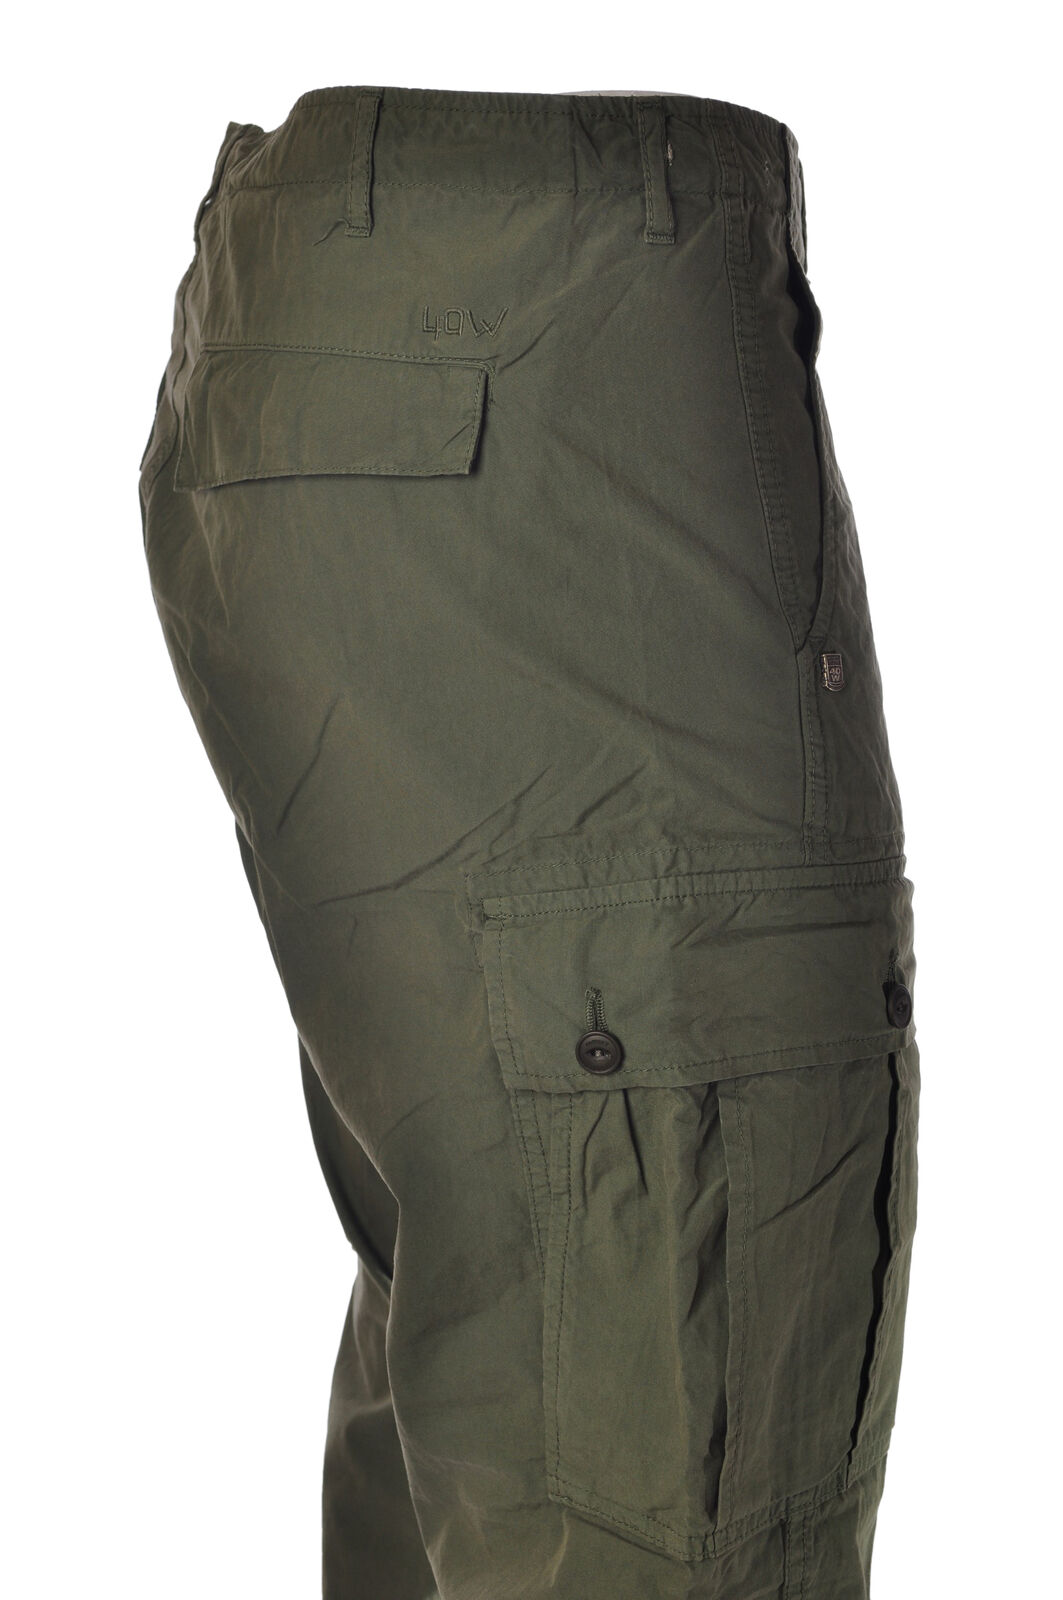 40 Weft - Jeans-straight leg Pants - Man - Green - 3539308C190748